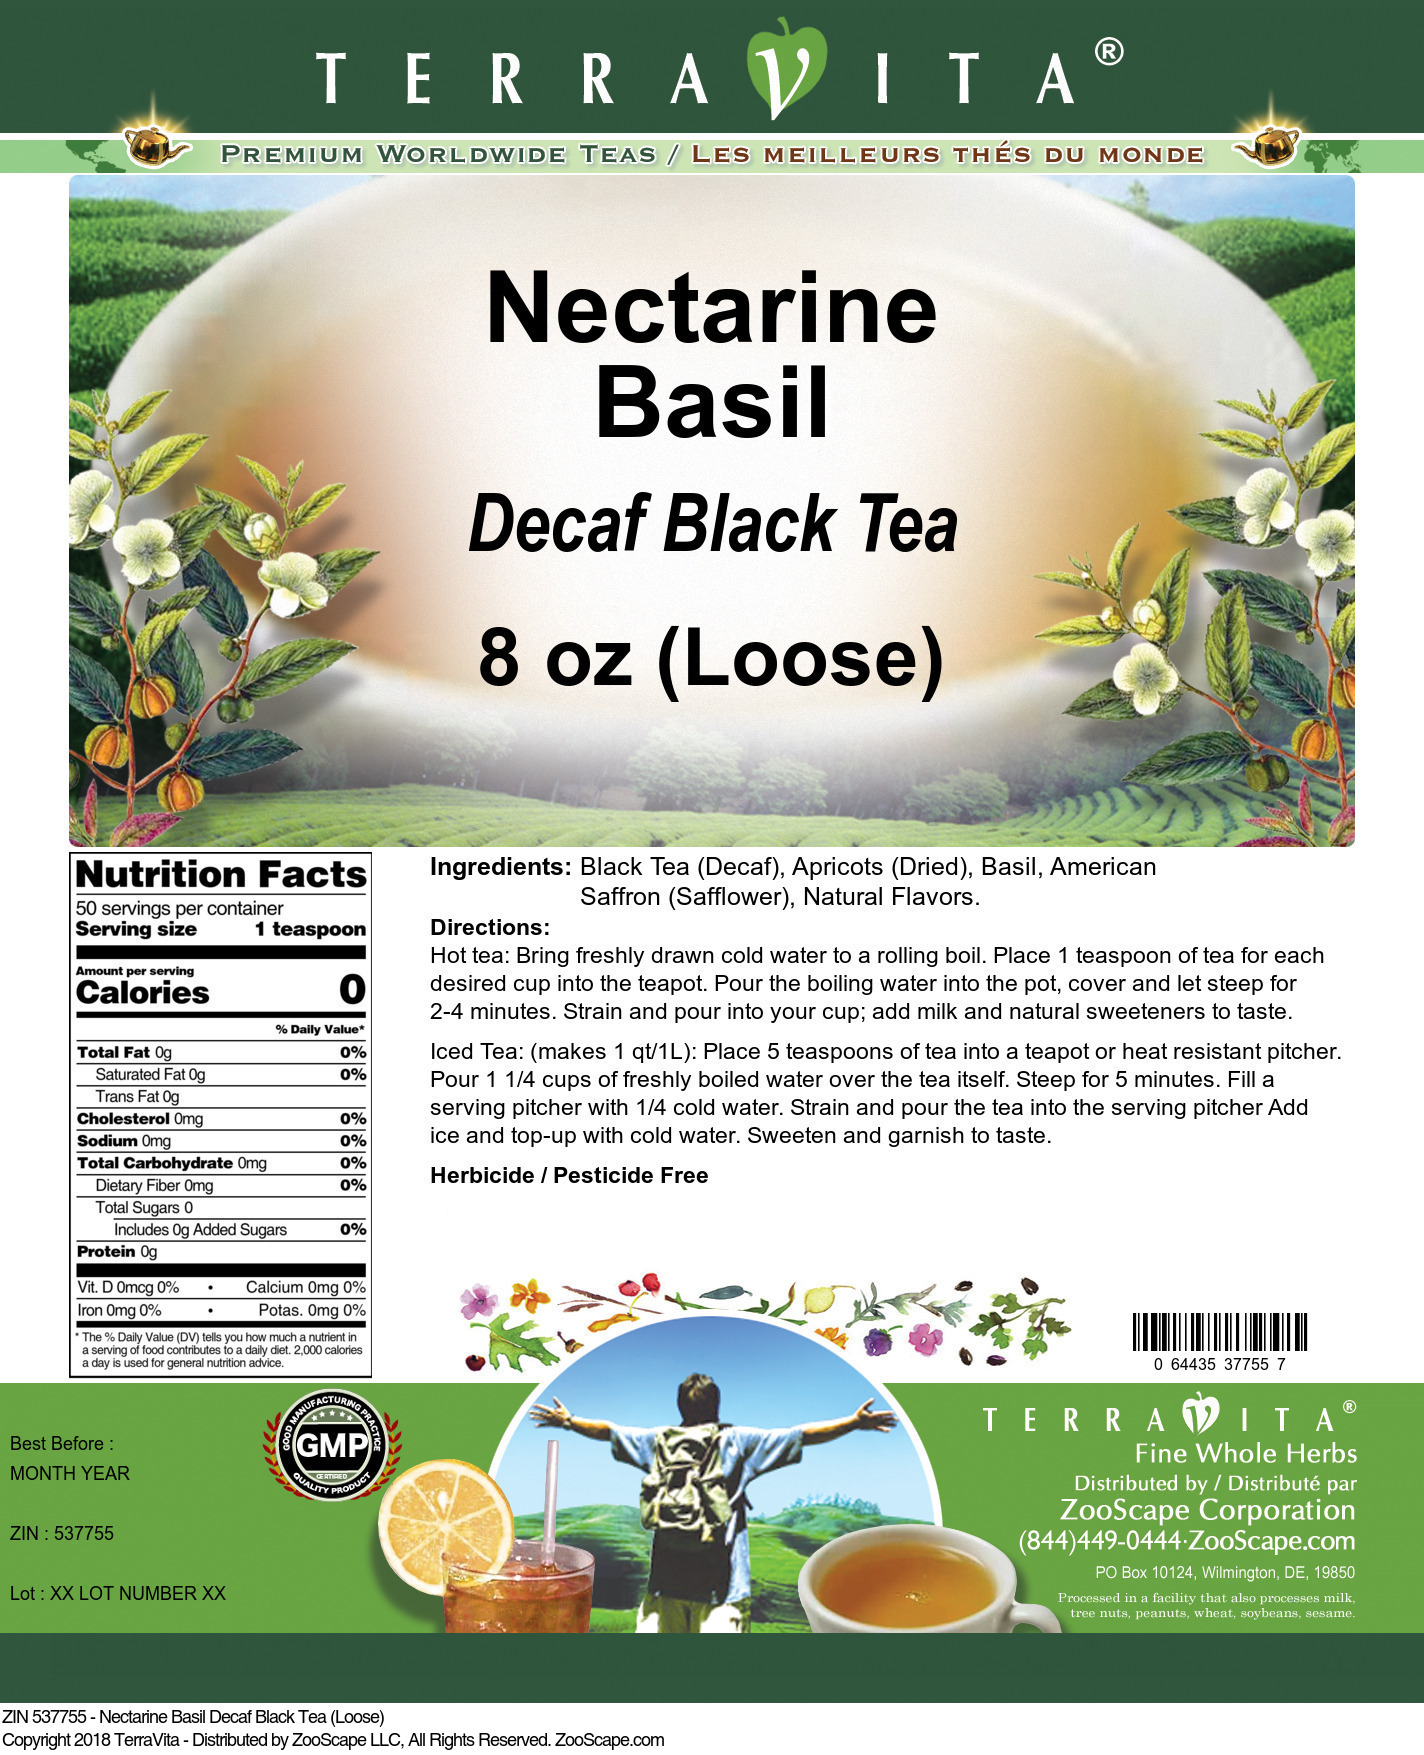 Nectarine Basil Decaf Black Tea (Loose)